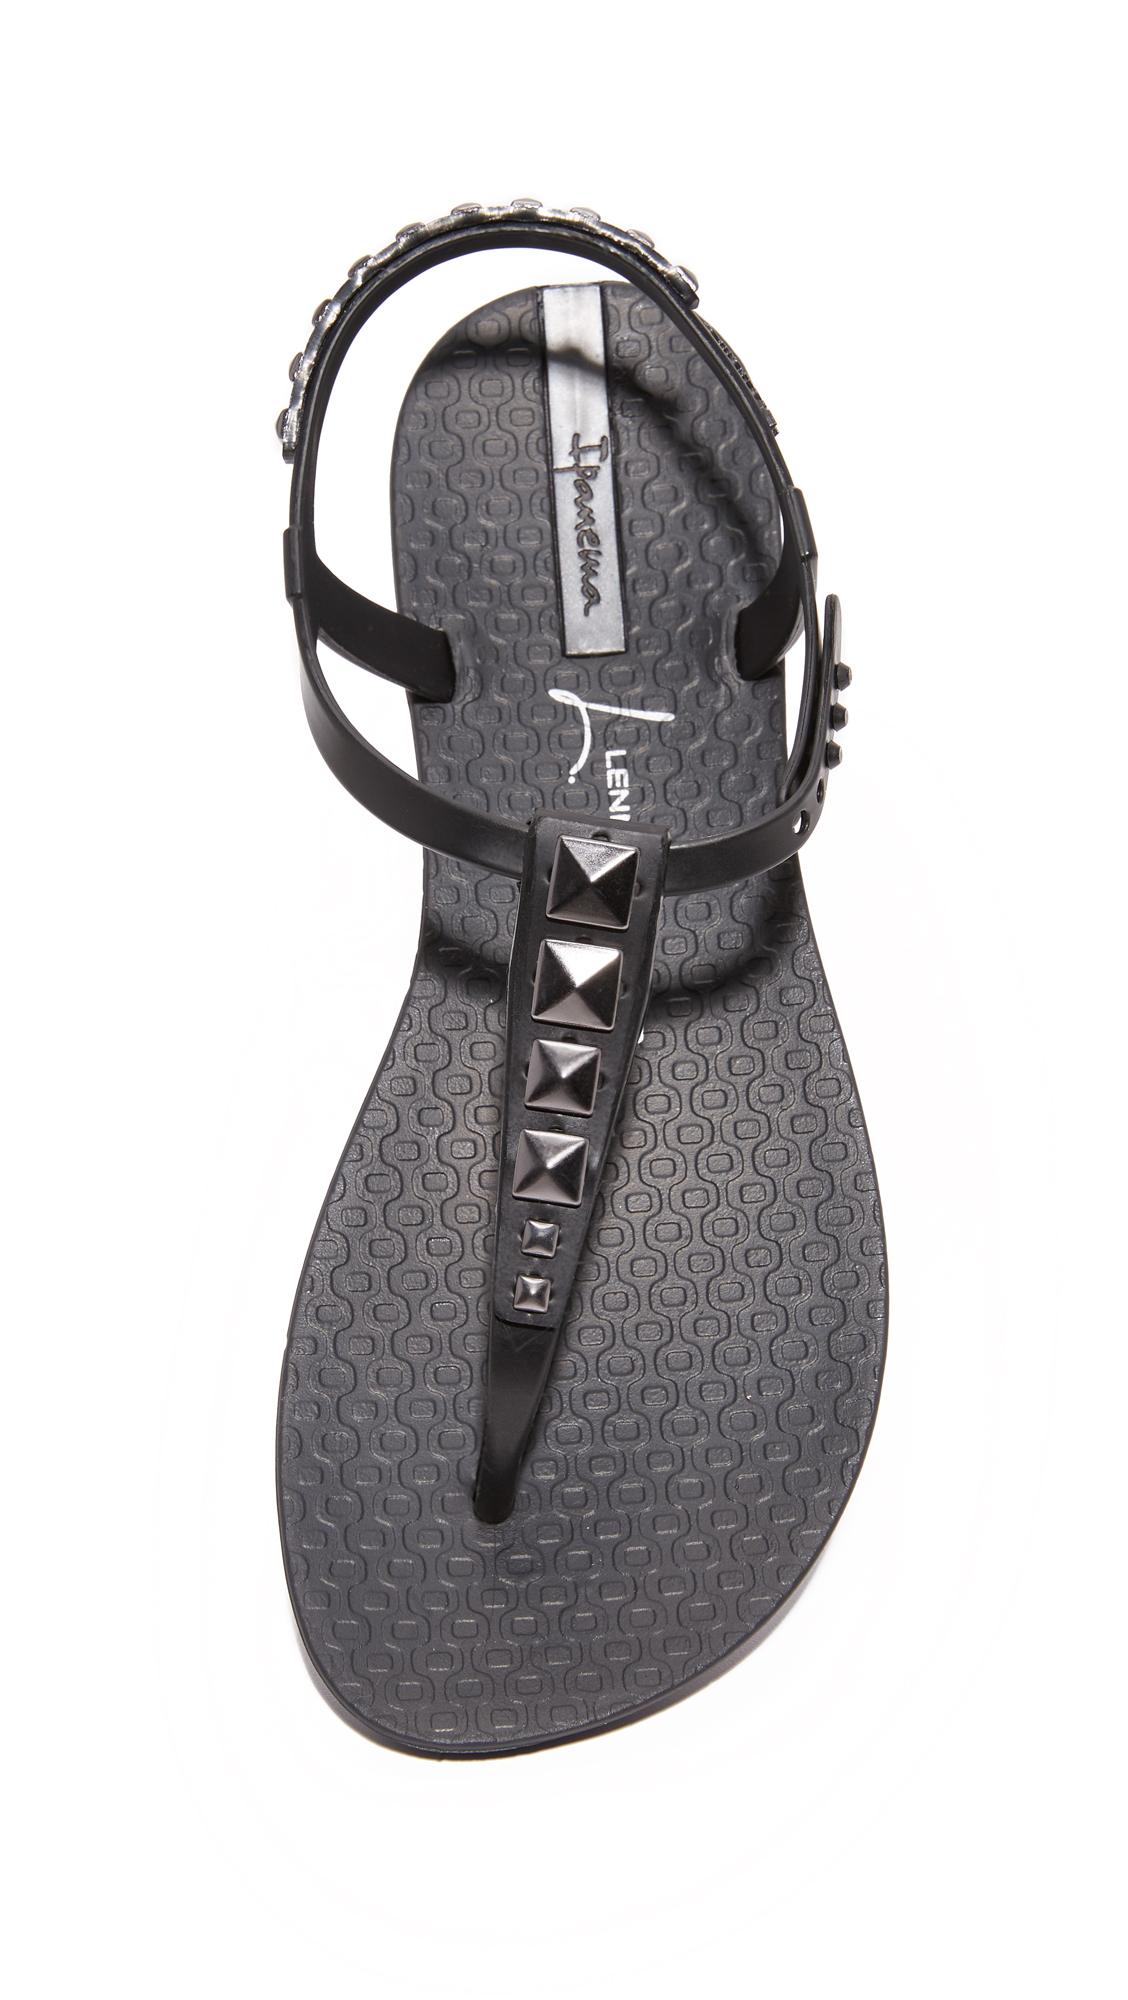 738b93dd4ed3 Ipanema Premium Lenny Rocker Sandals